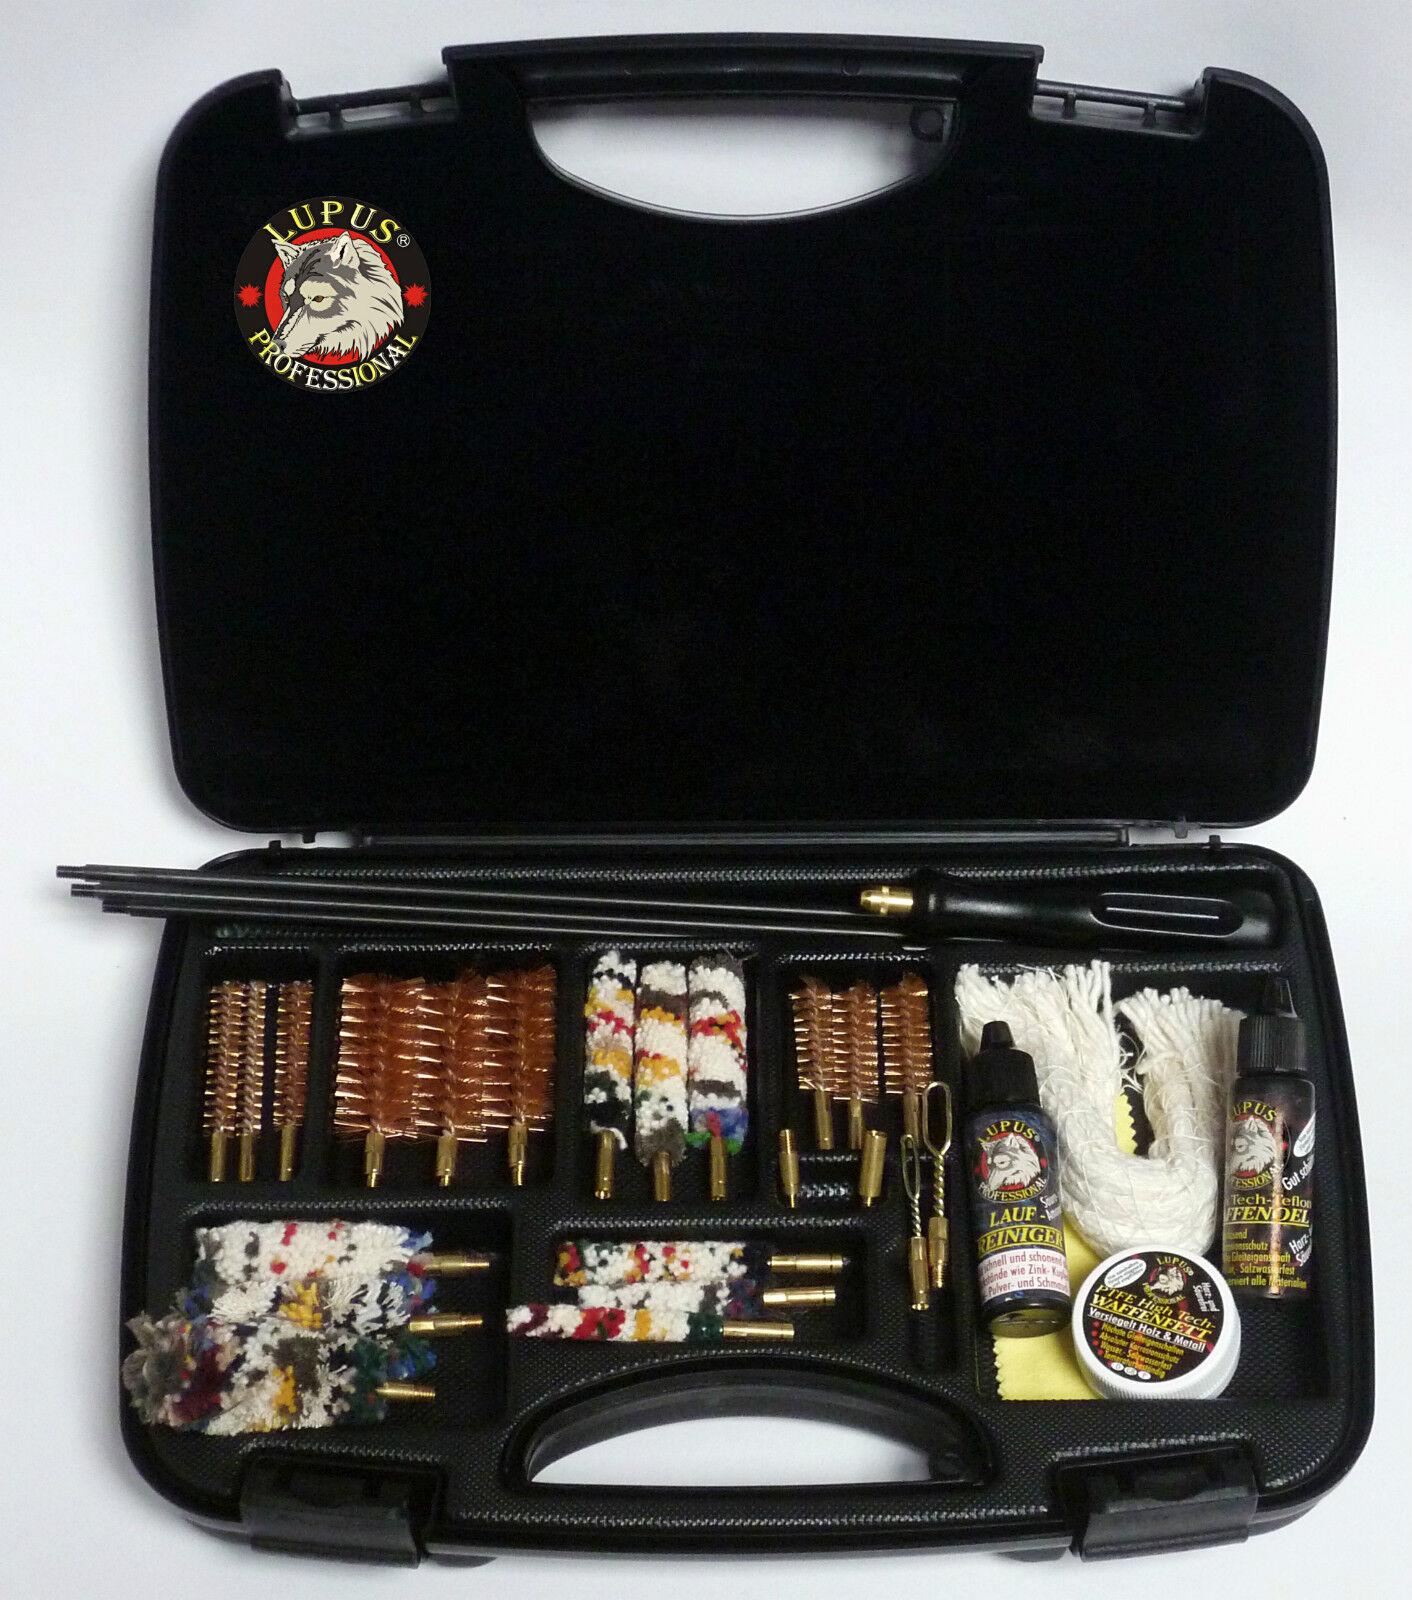 Waffenreinigungsset - Waffenputzset - Waffenpflegeset für Flinte Flinte Flinte Büchse Kurzw. b920e4